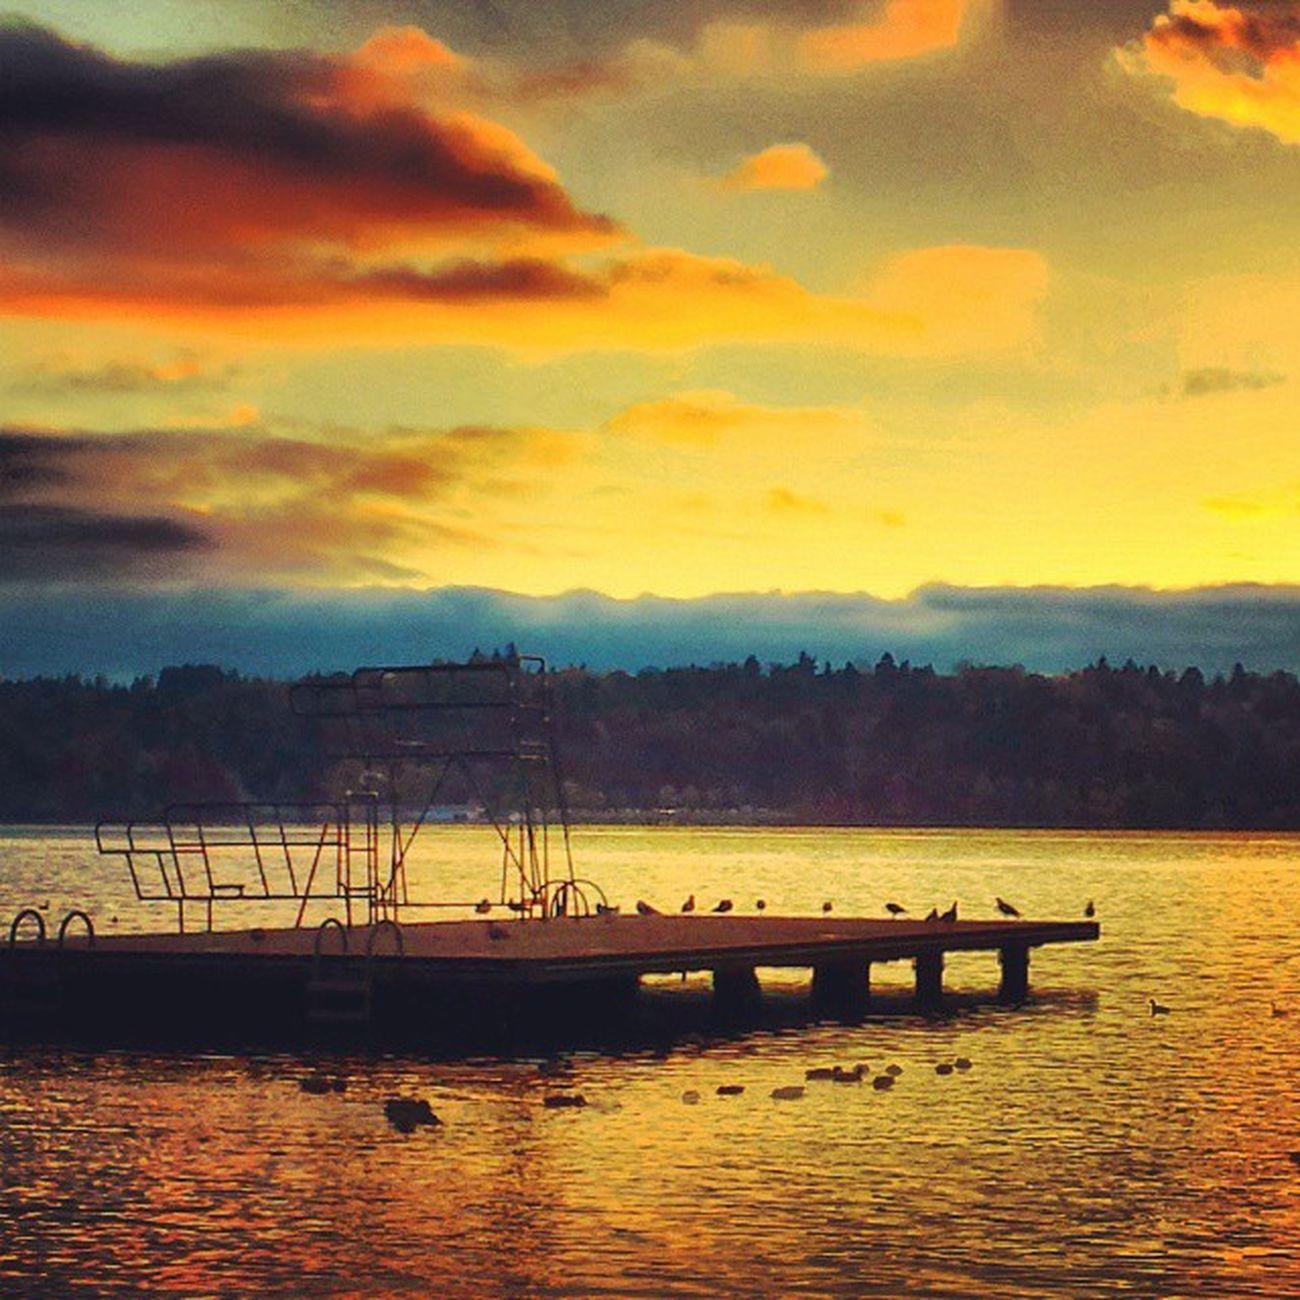 Green Lake at sunset